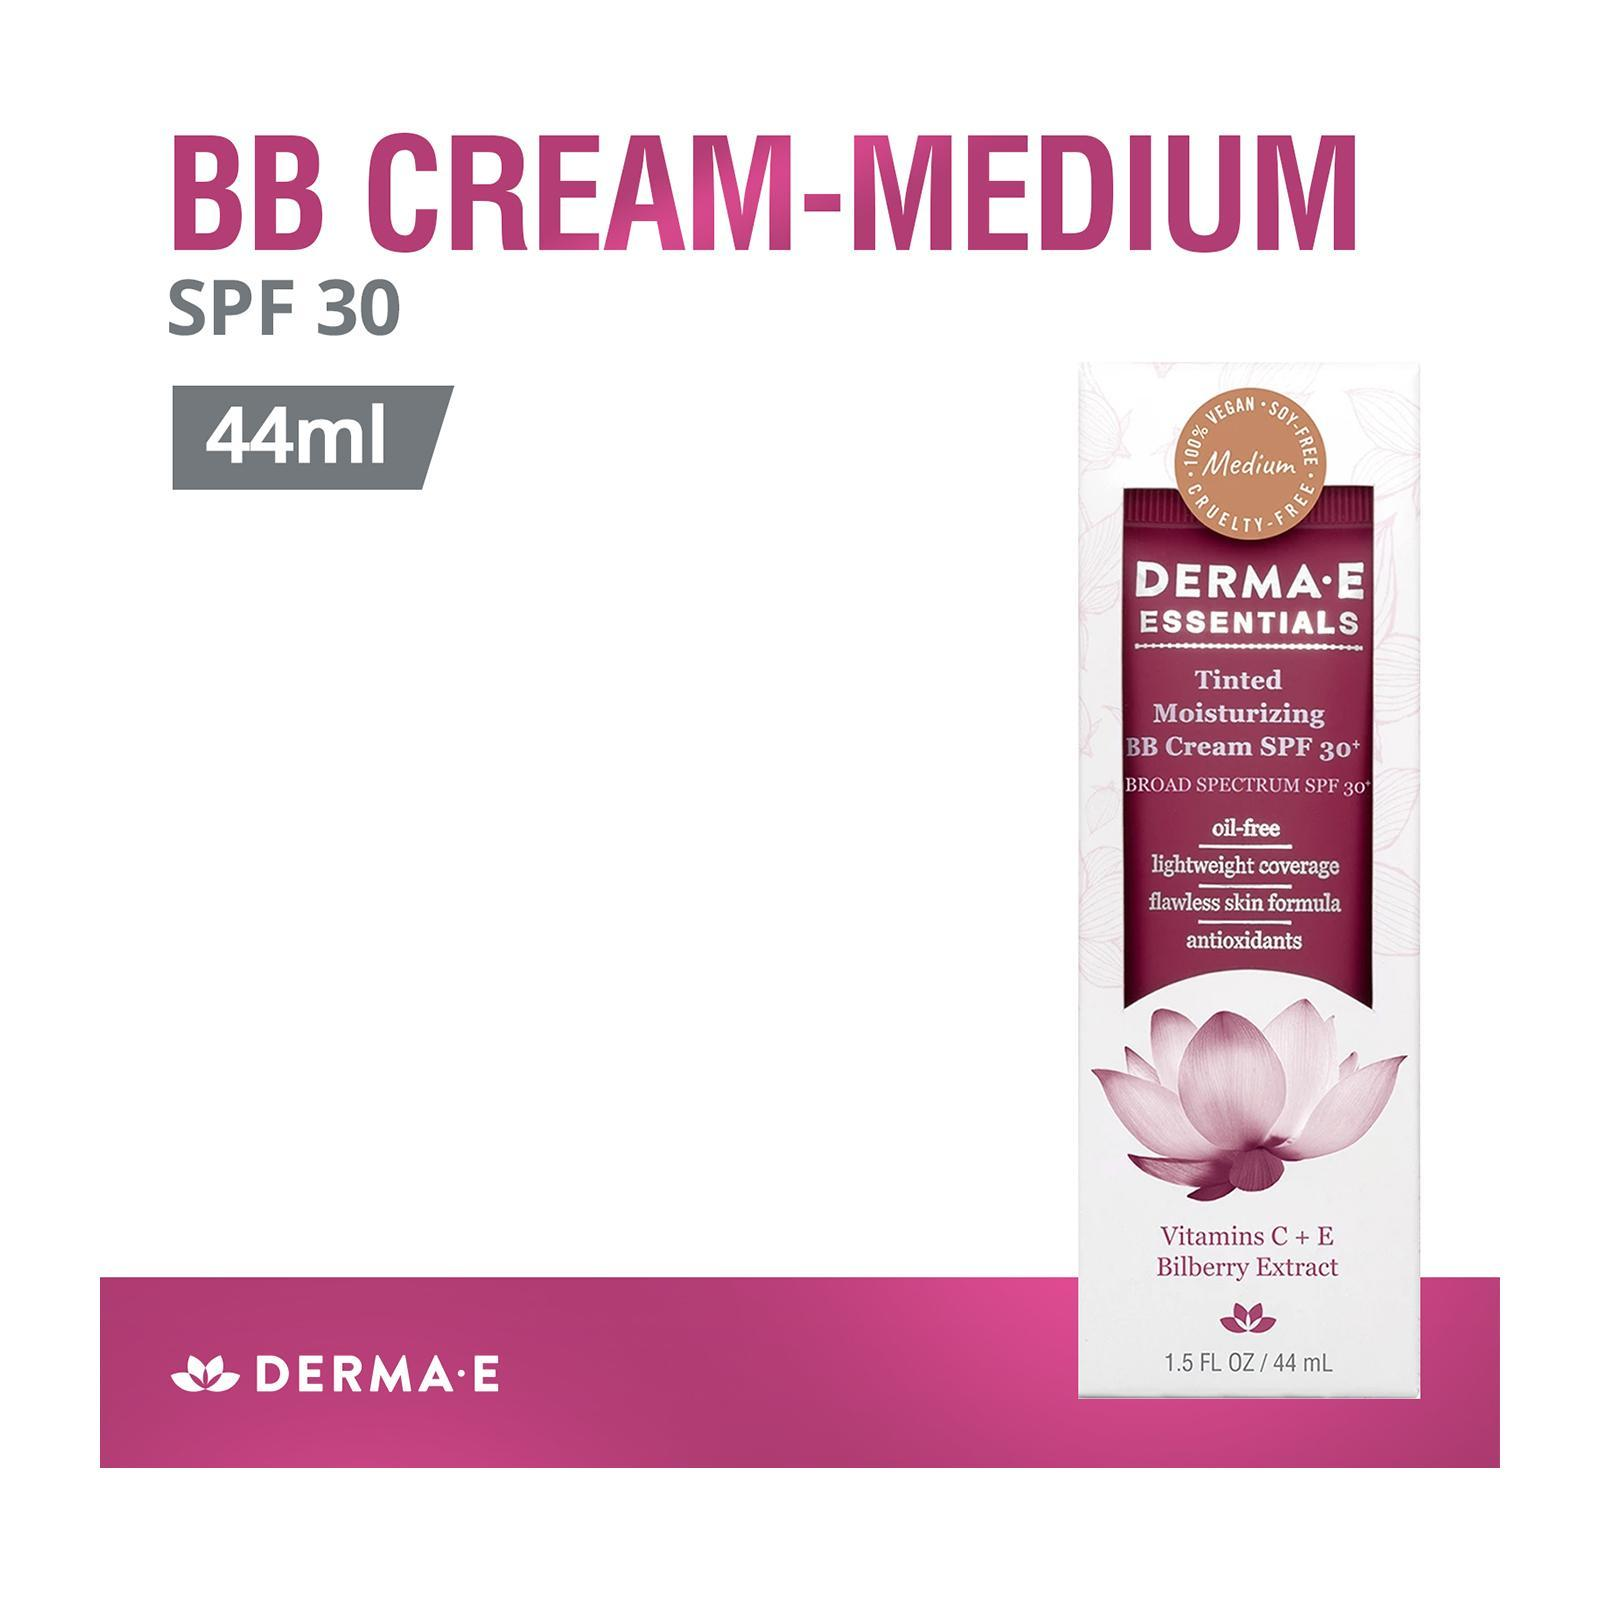 Derma E Medium-Tinted Moisturizing BB Cream SPF 30+